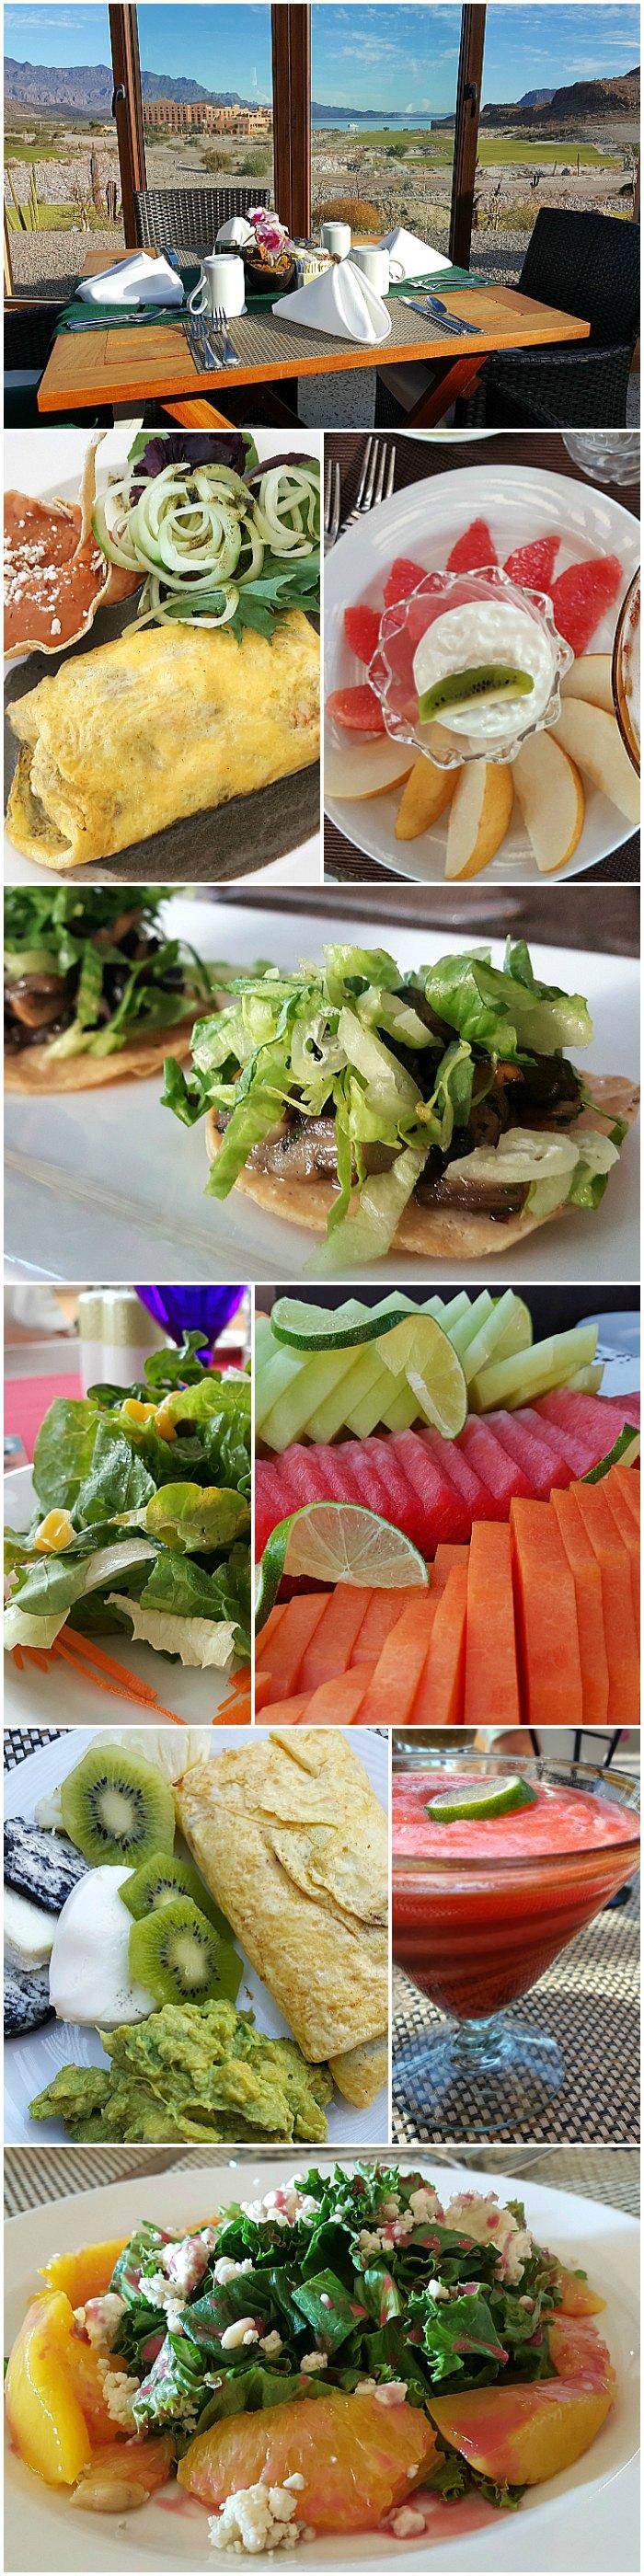 Plenty of Vegetarian options at the all inclusive Villa Del Palmar Loreto, Baja California Sur, Mexico